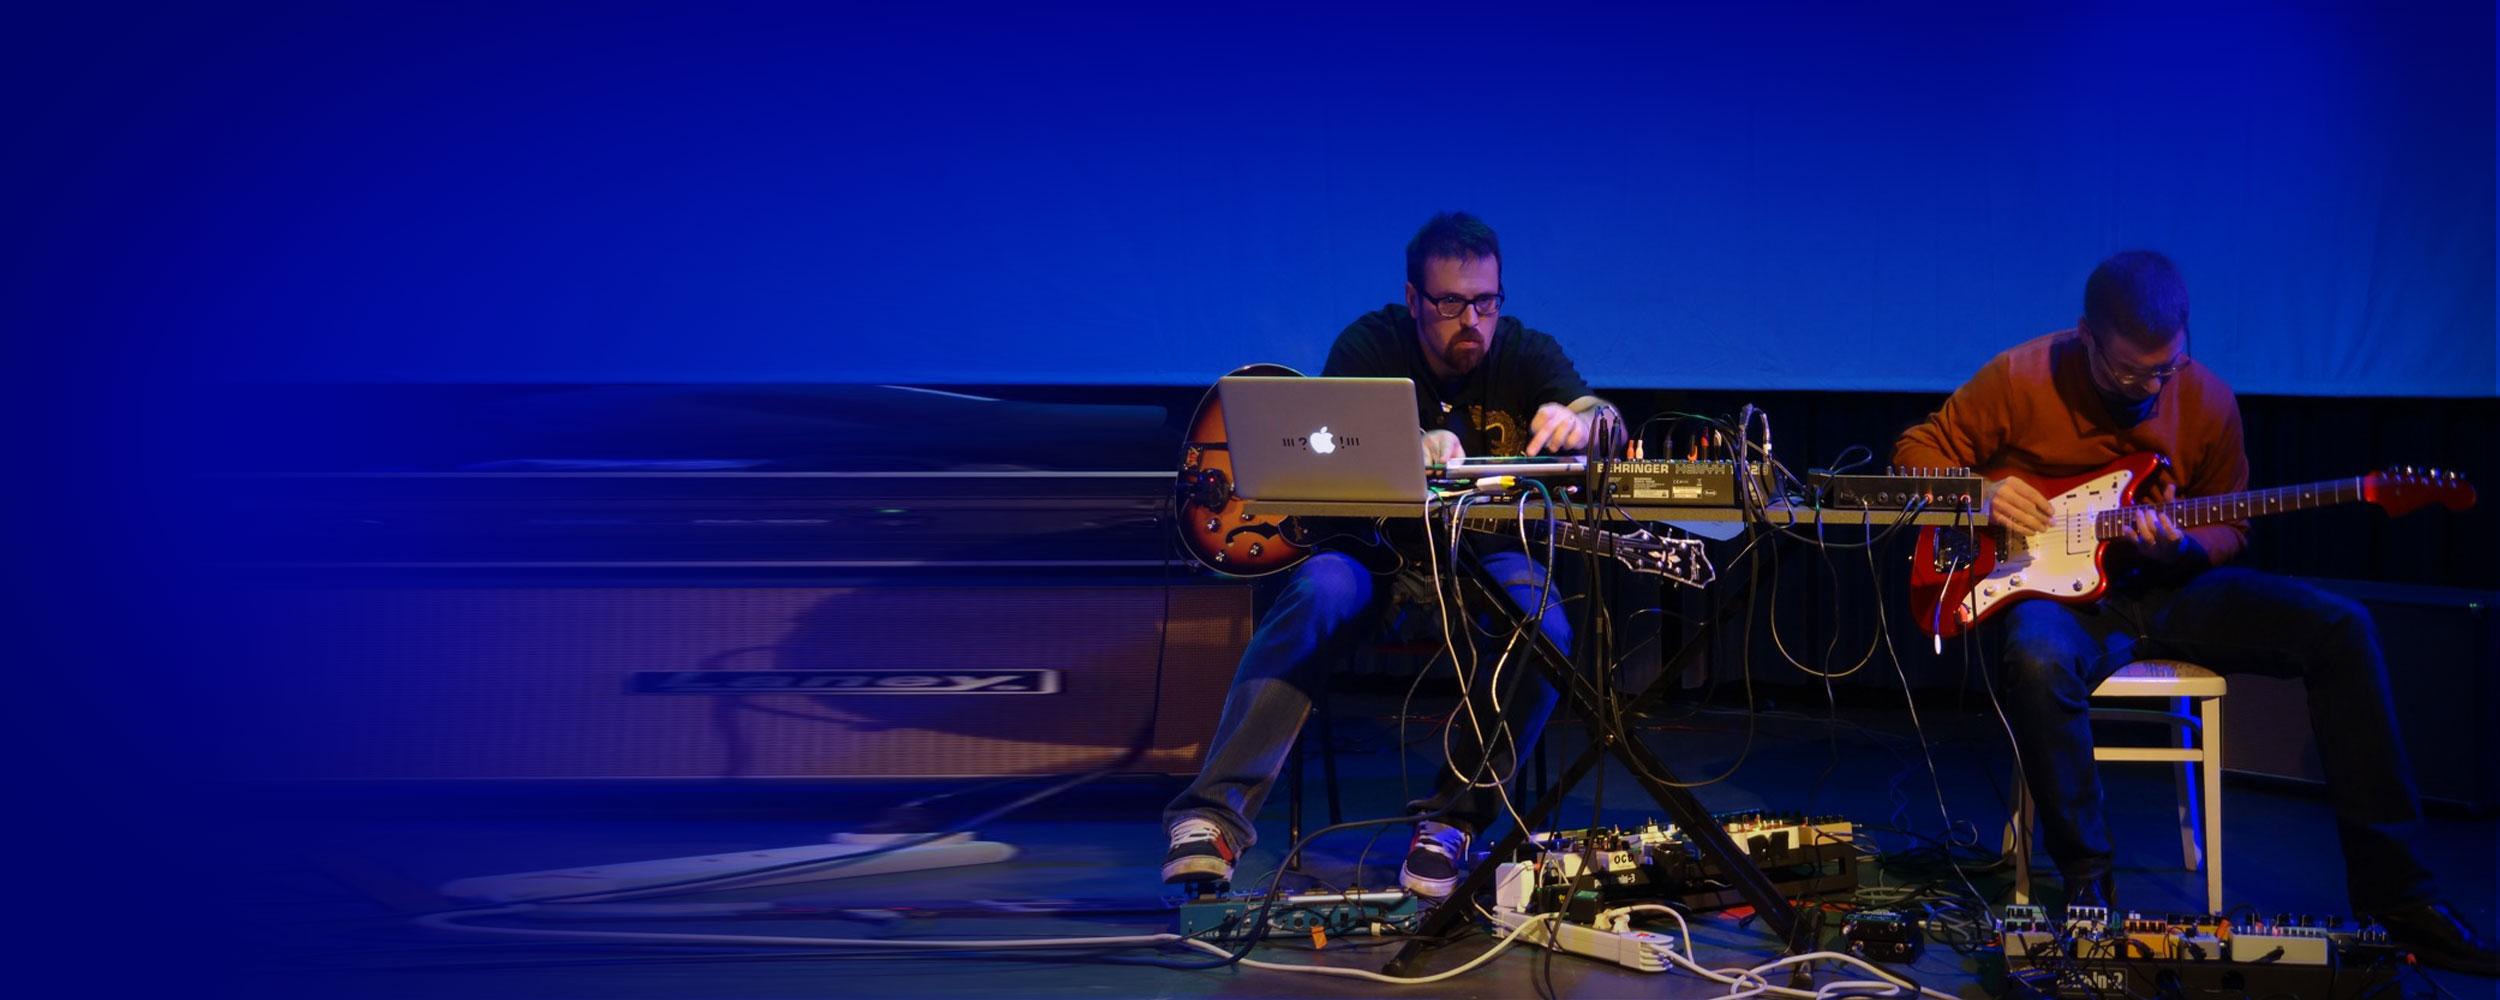 PNEM Sound Art Festival